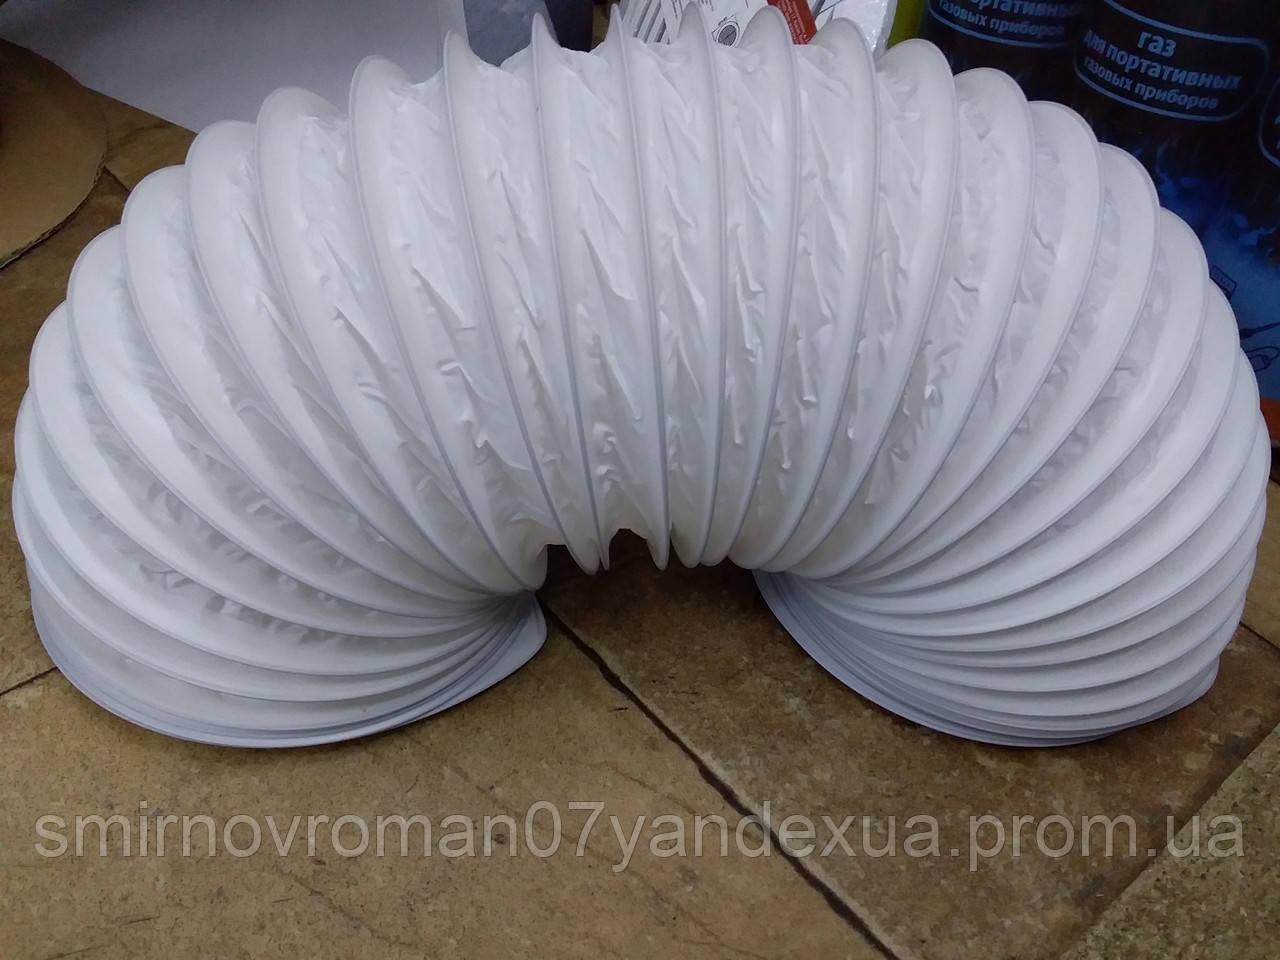 Воздуховод гибкий армированный ПВХ 100 мм. L=2 м